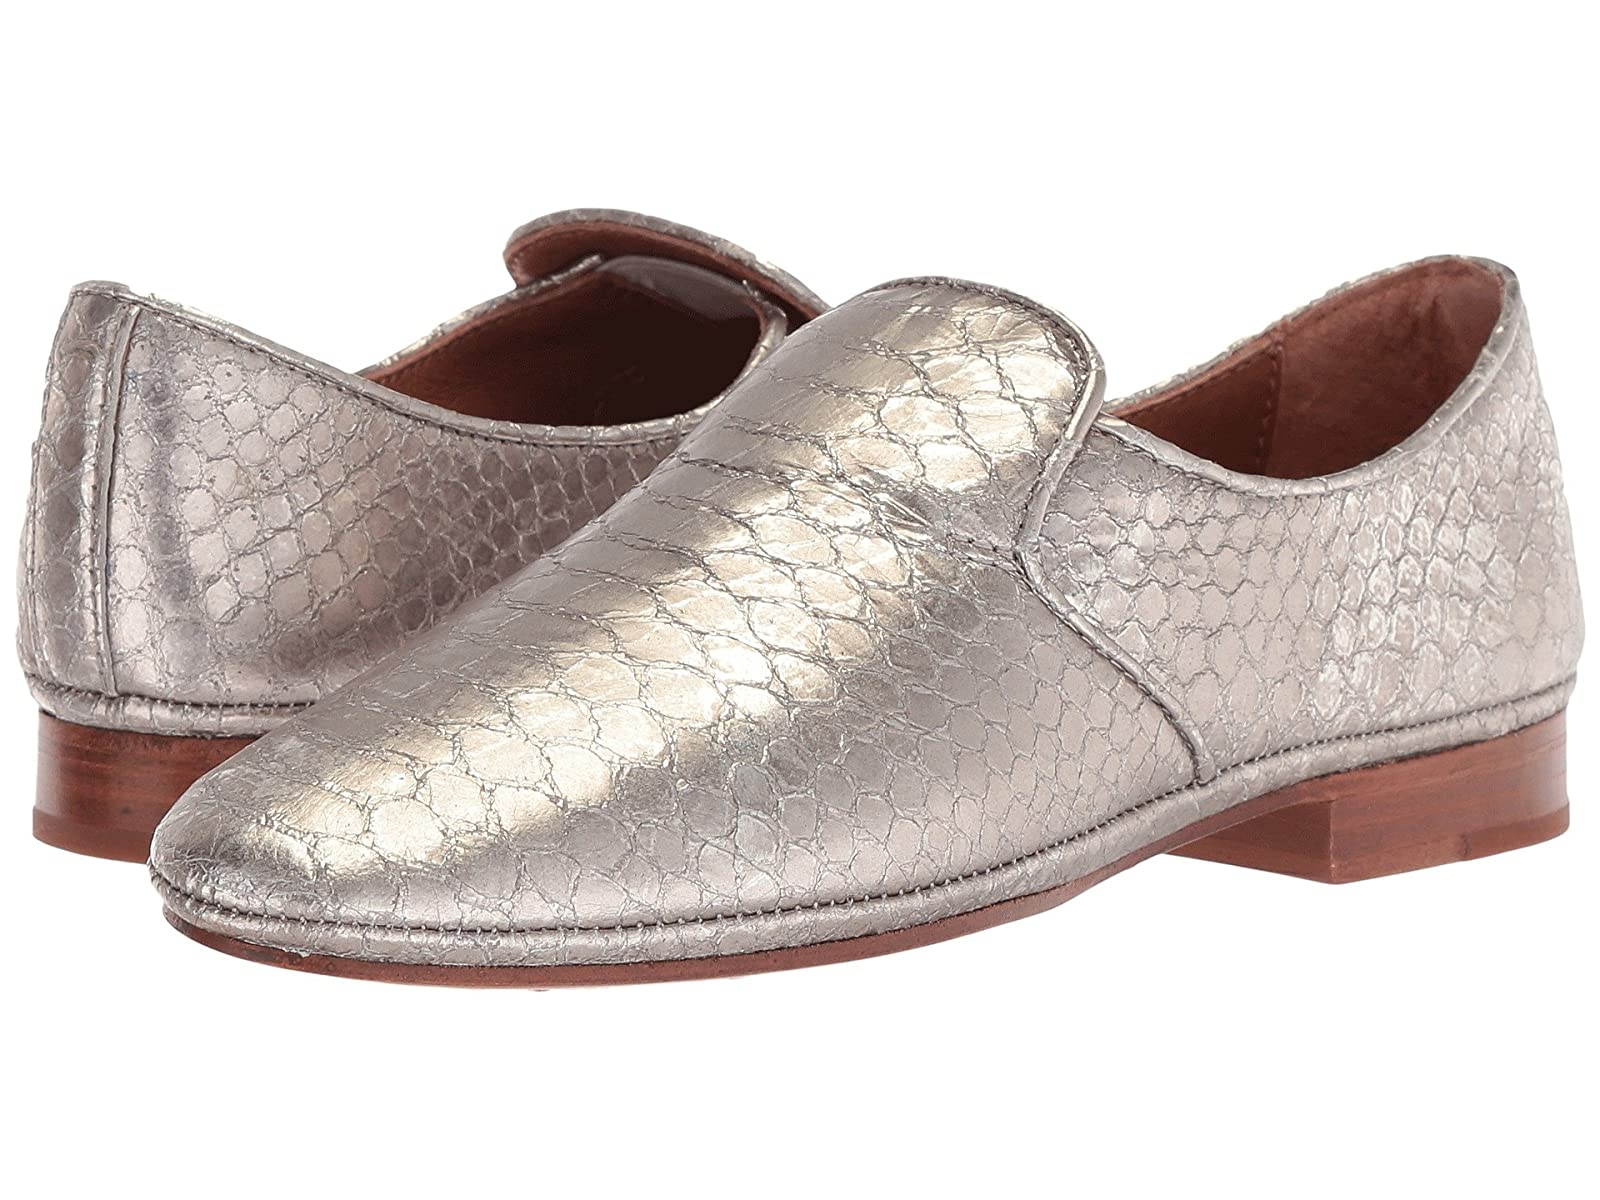 Frye Ashley Slip-OnCheap and distinctive eye-catching shoes